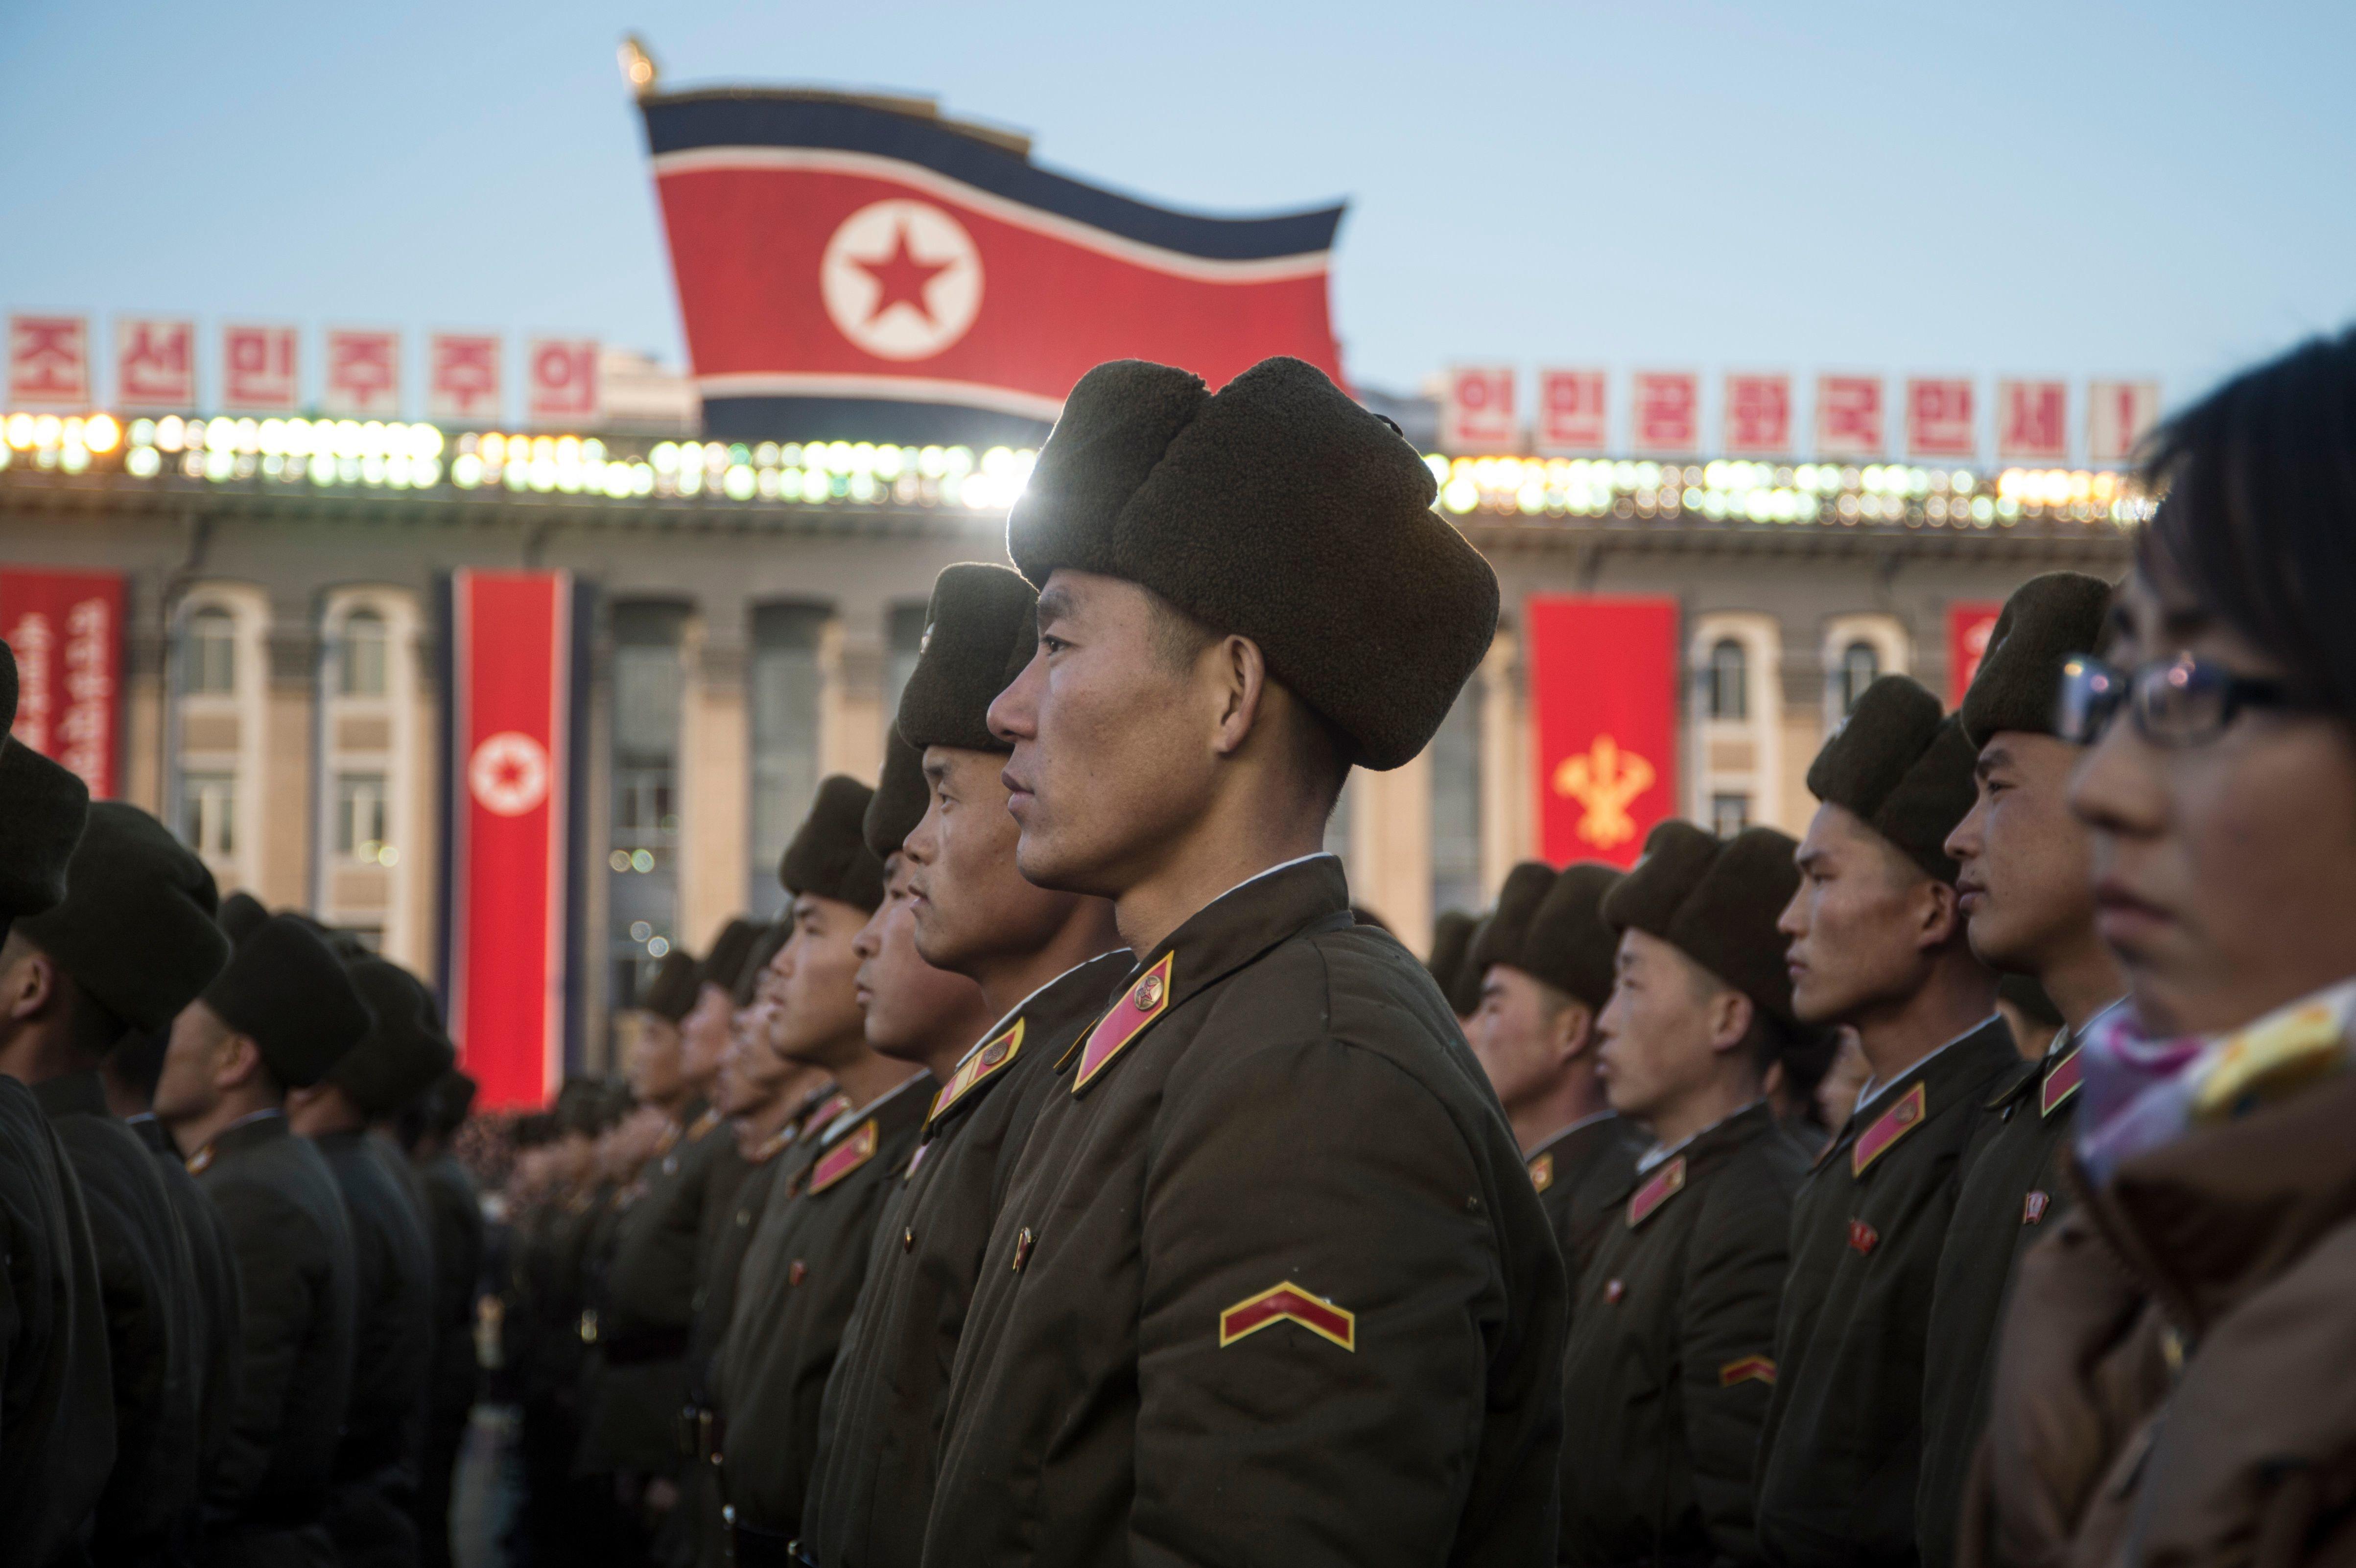 North Korean Defectors Show Signs Of Possible Radiation Exposure